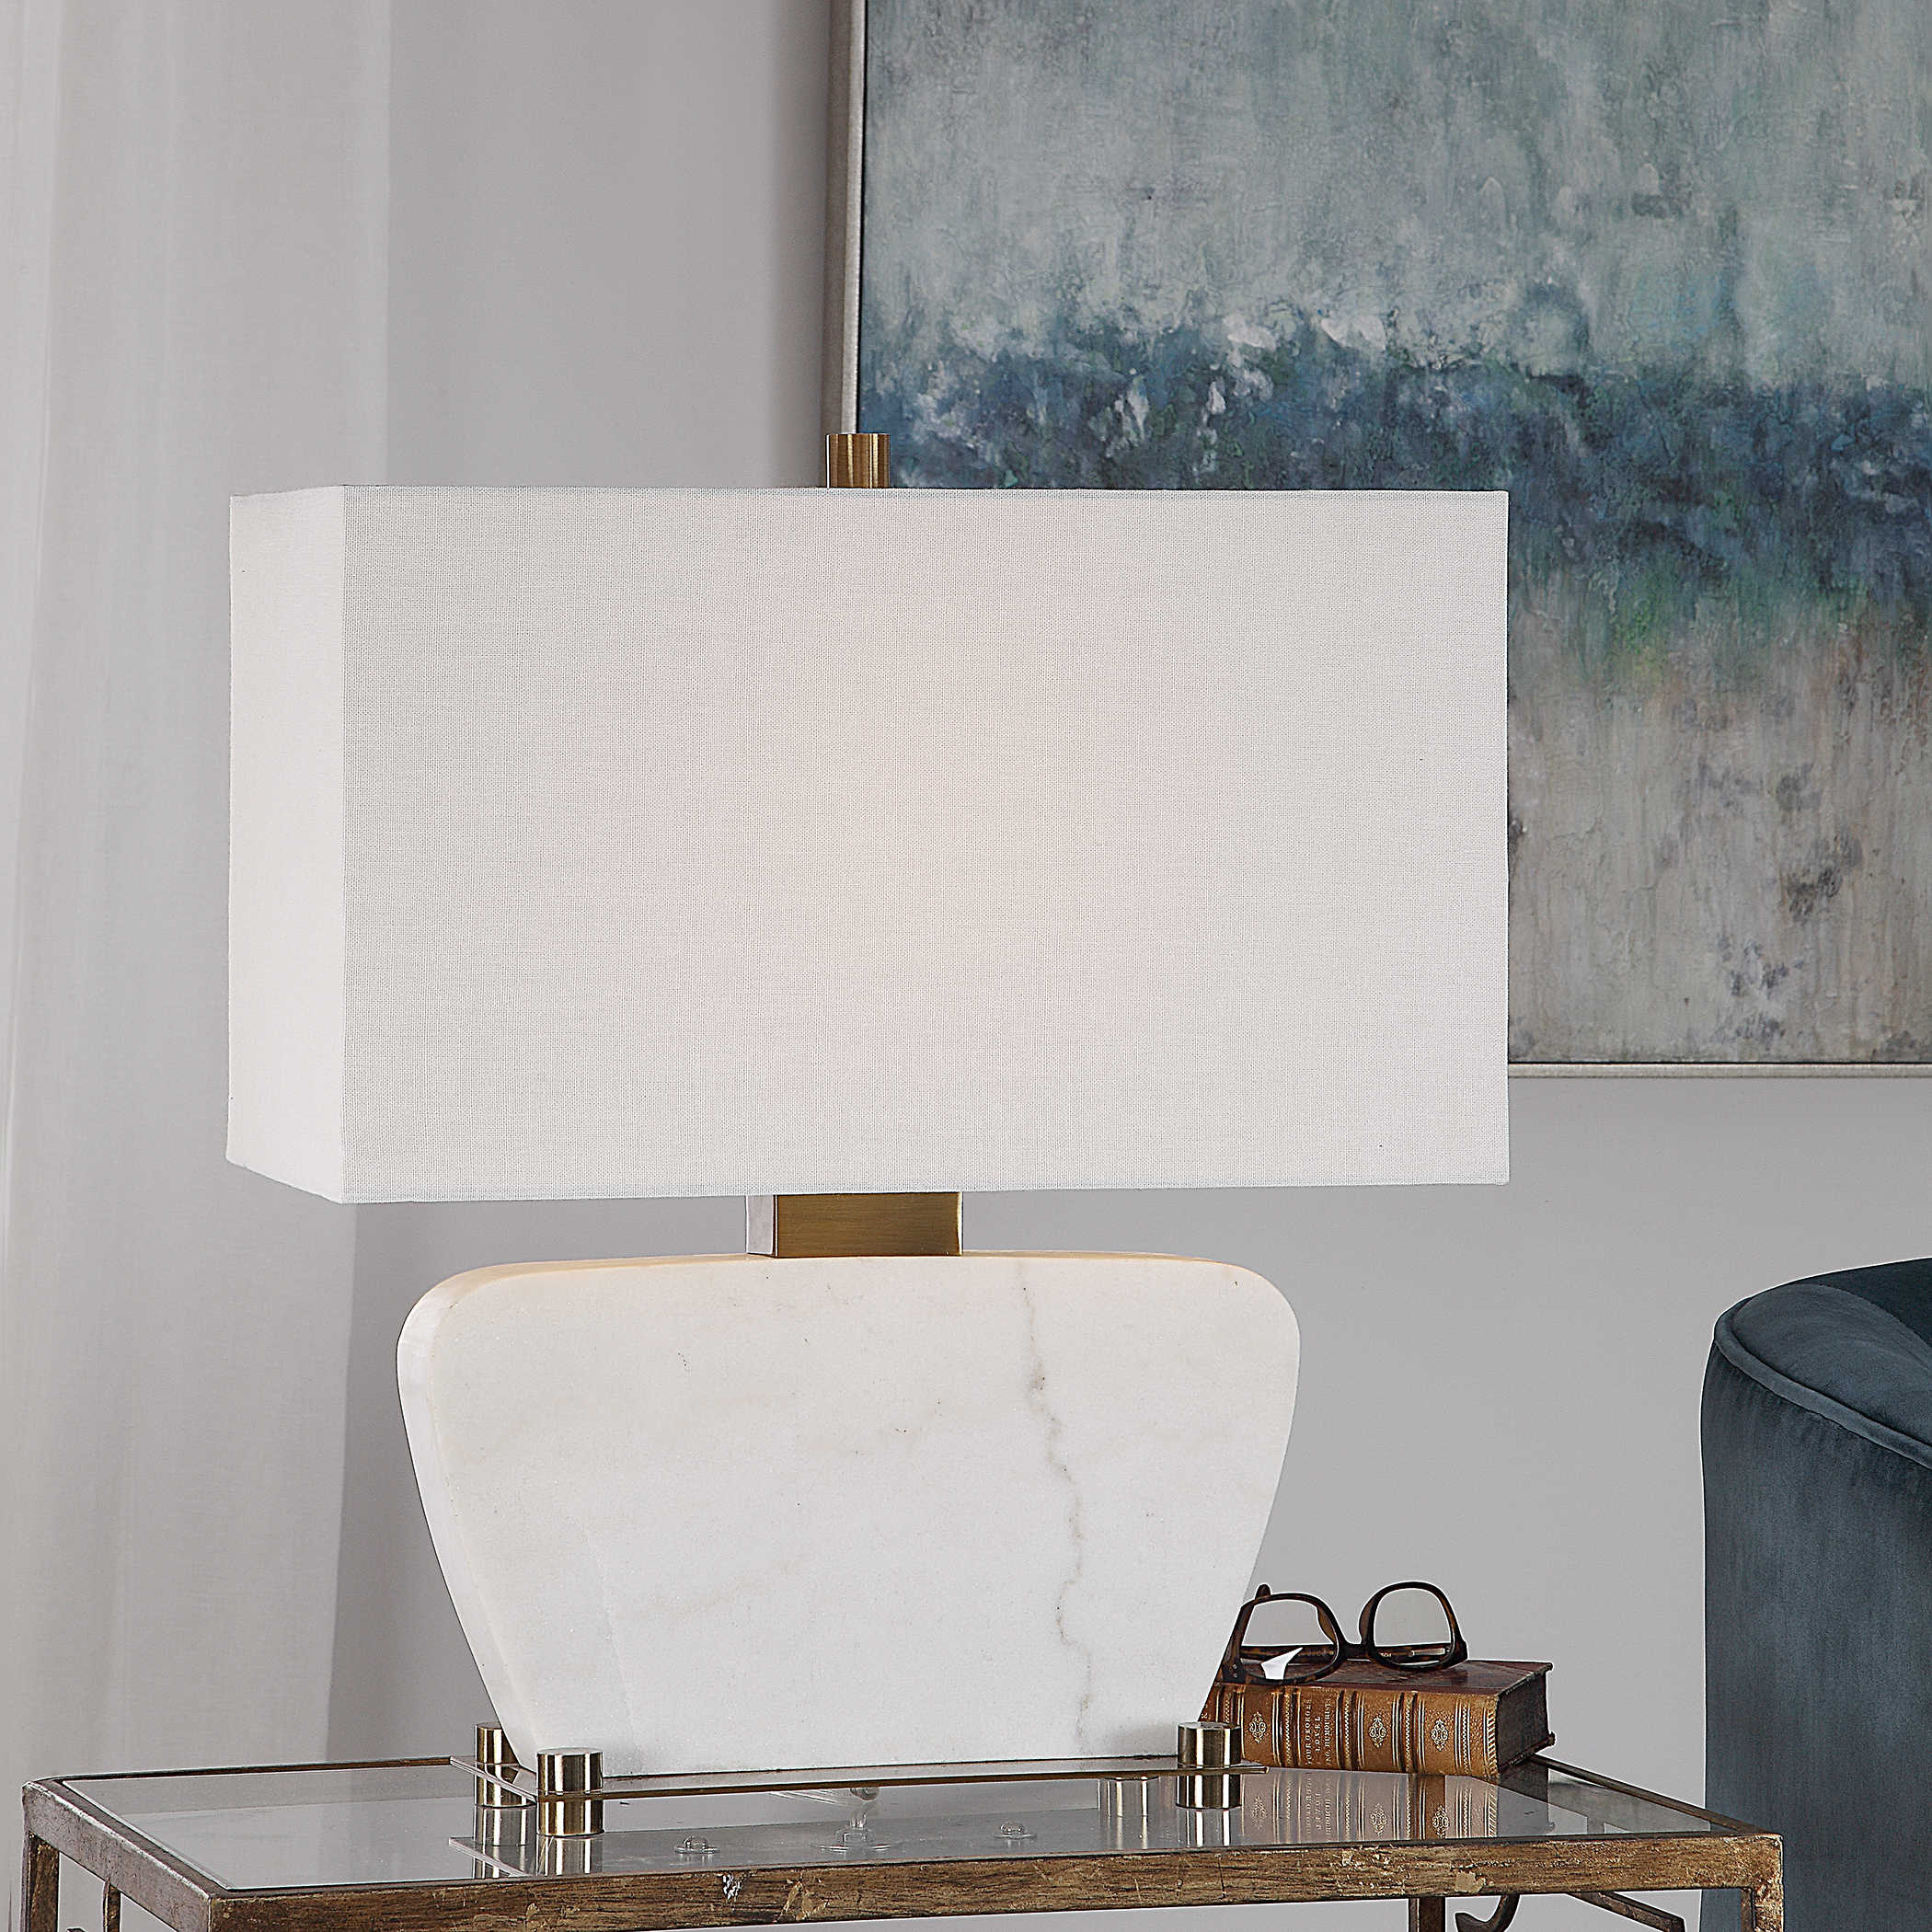 Uttermost Accent Furniture, Mirrors, Wall Decor, Clocks